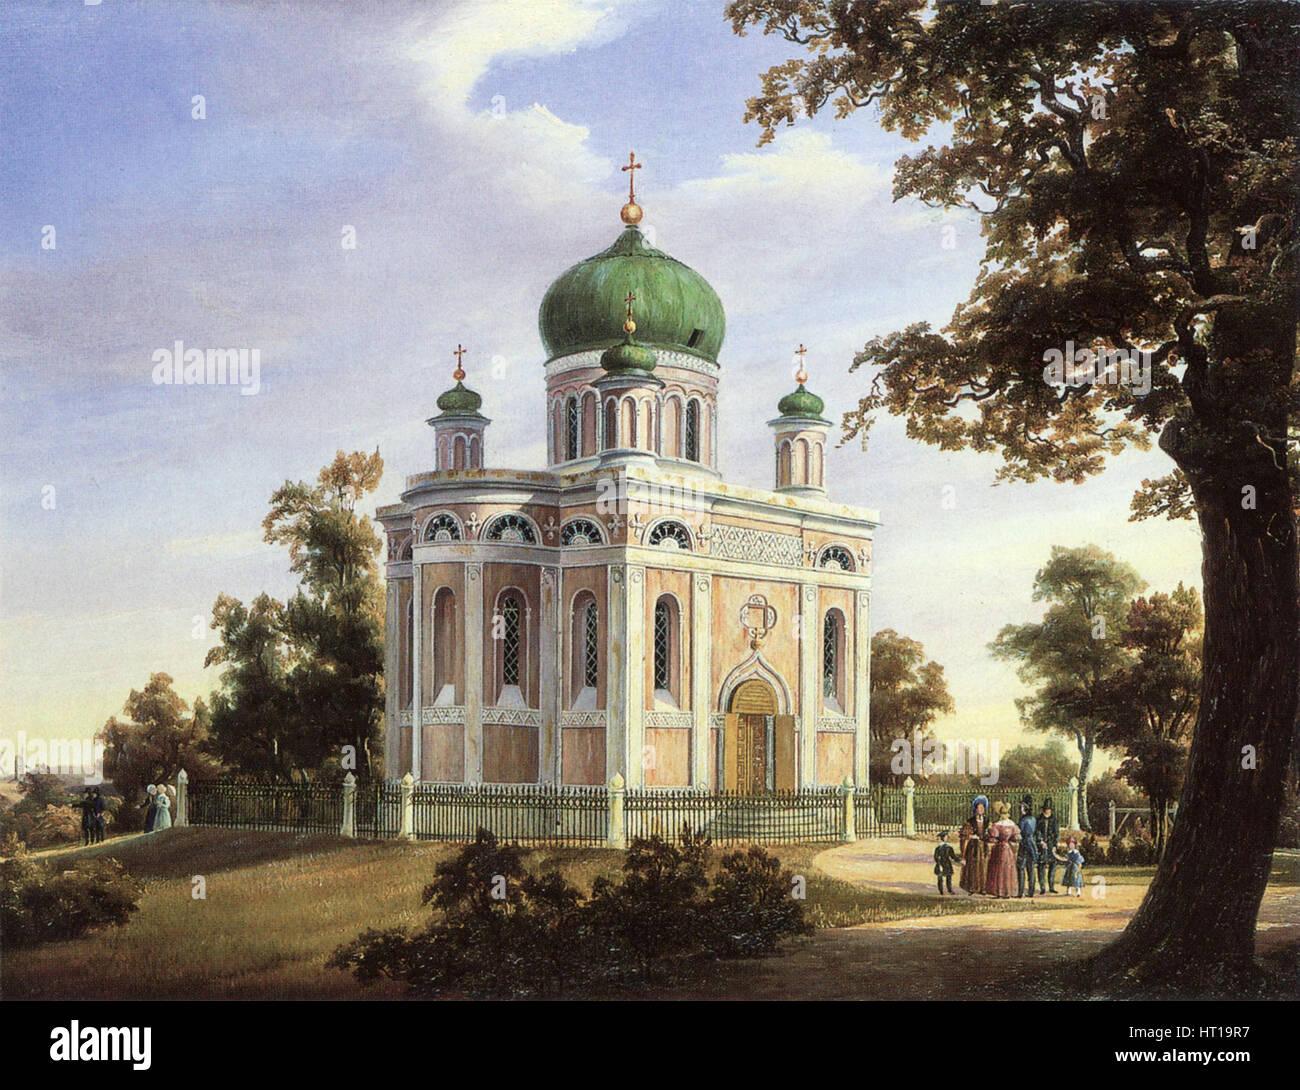 Alexander Nevsky Church at Potsdam, 1838. Artist: Freydanck, Carl Daniel (1811-1887) - Stock Image